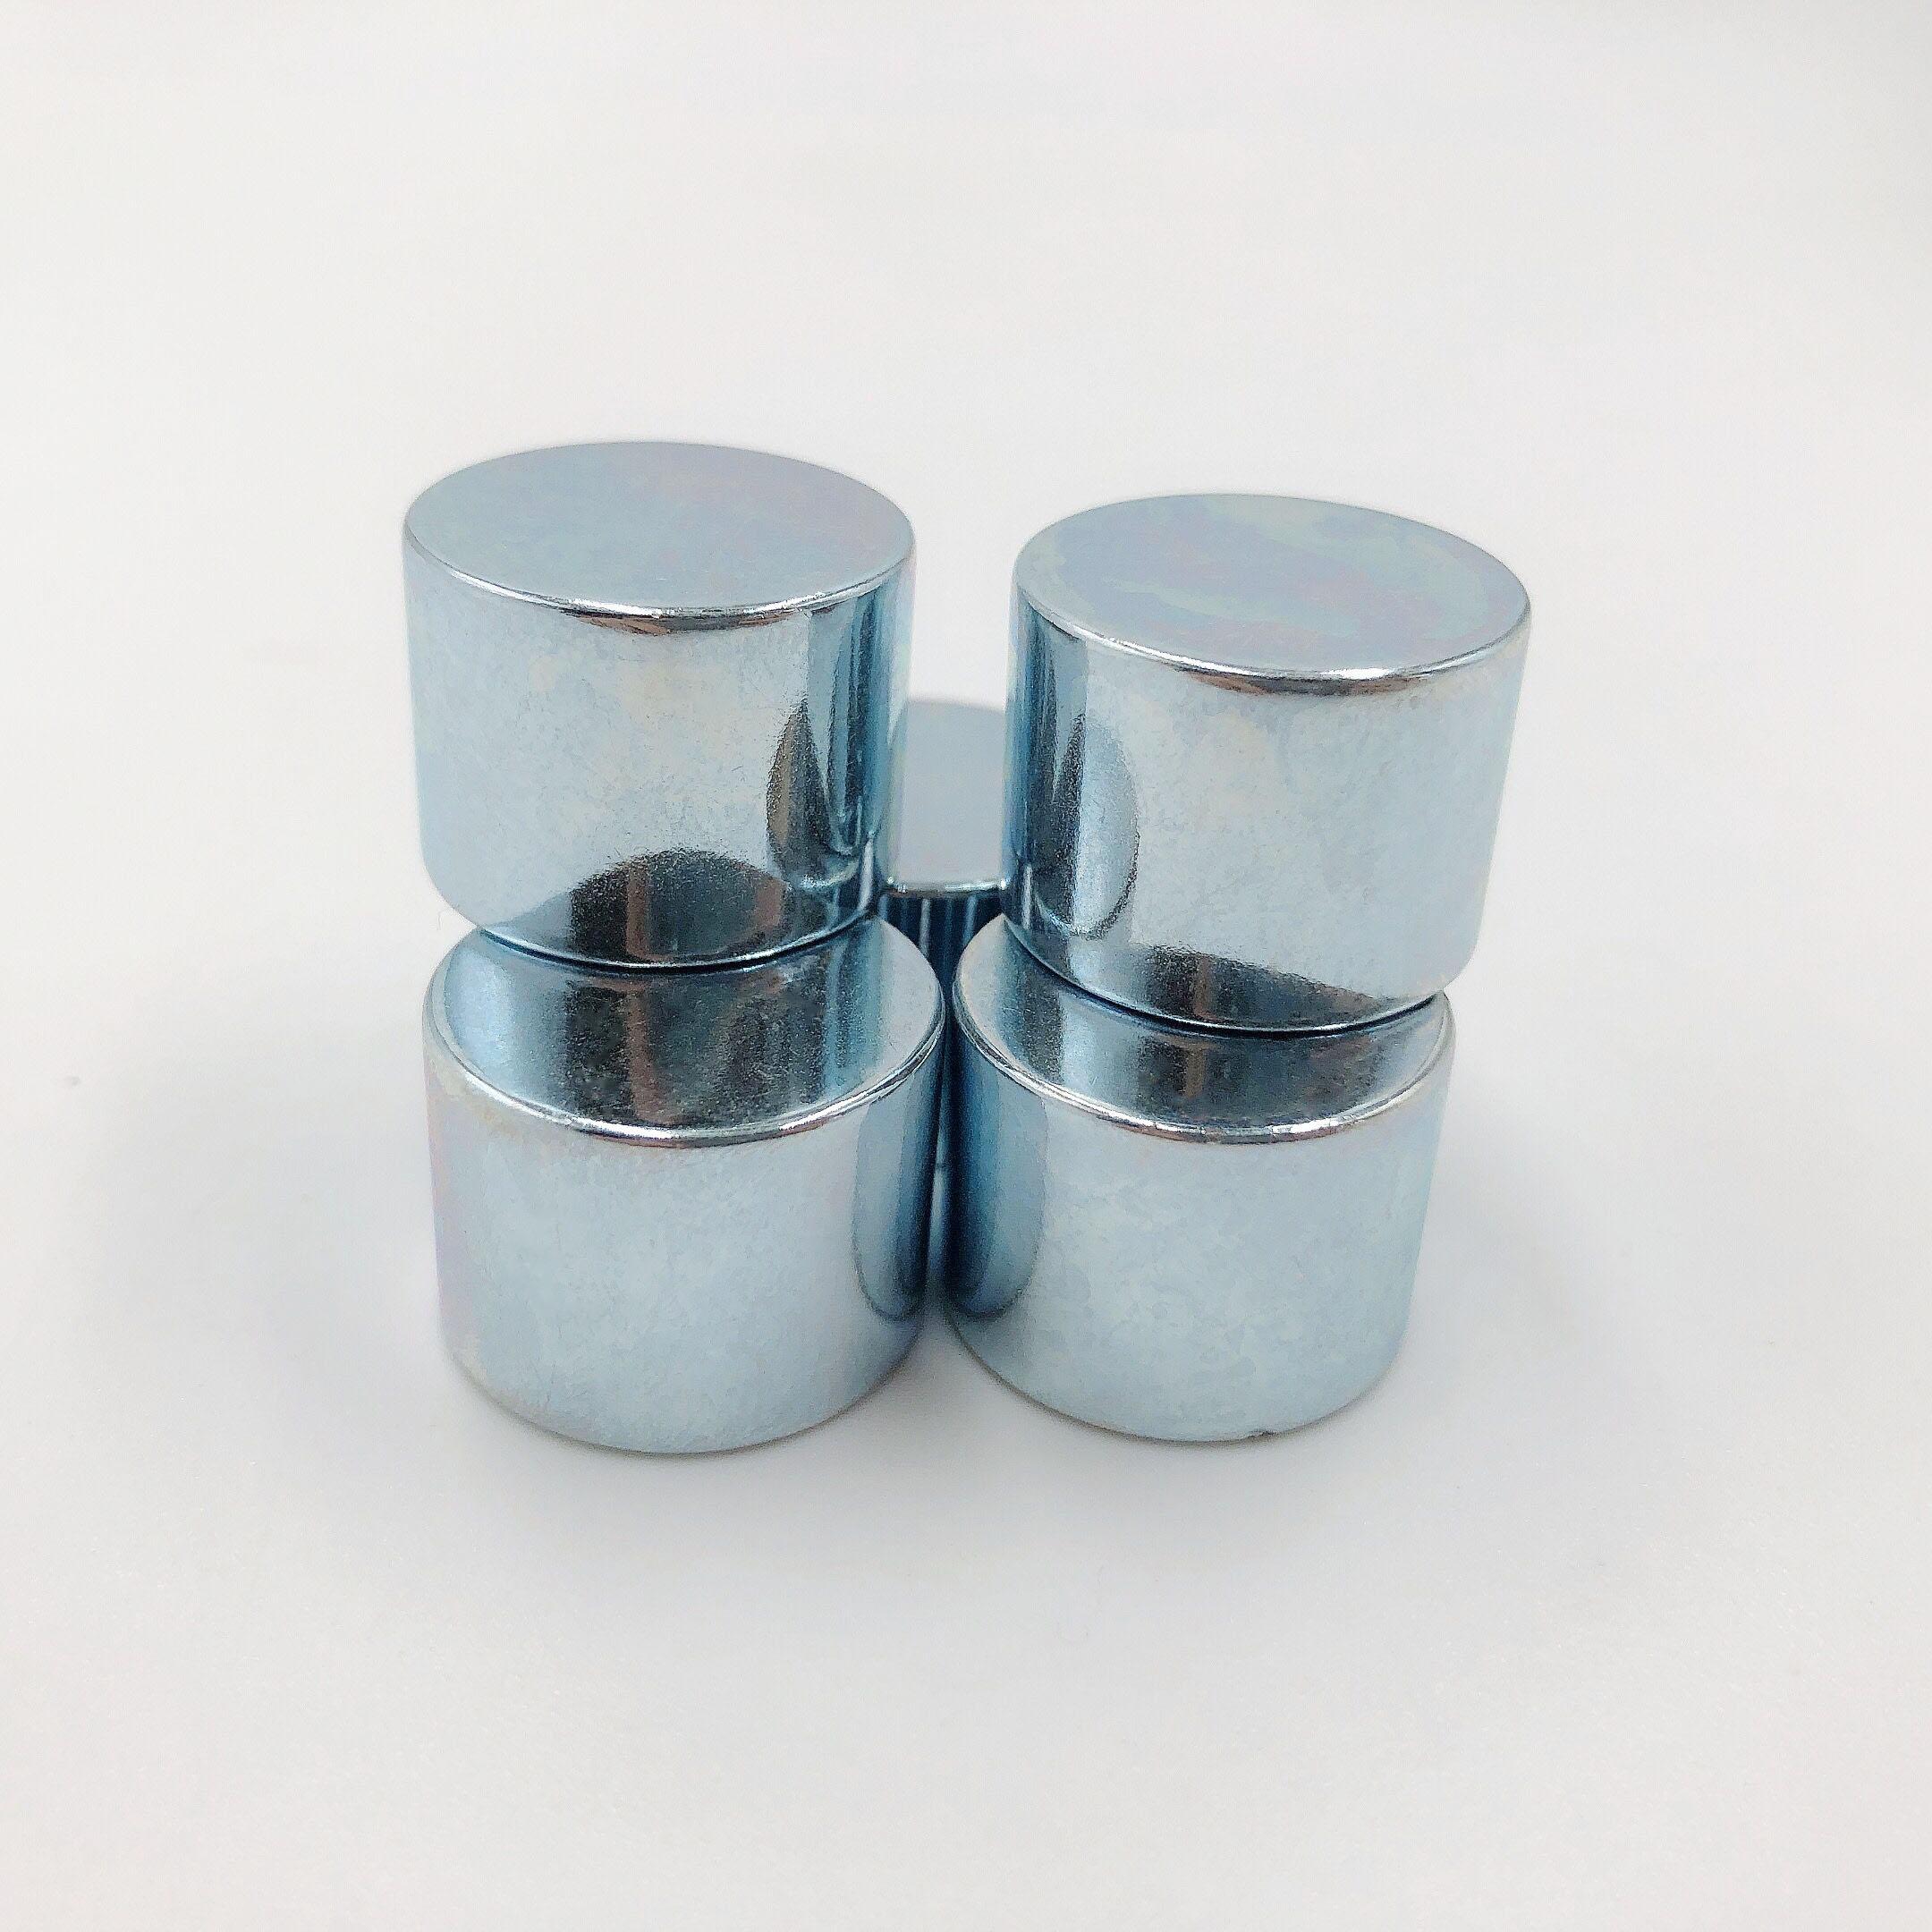 Factory Custom Cheap Golden Supplier Hard Round Small Circular Neodymium Magnet N52